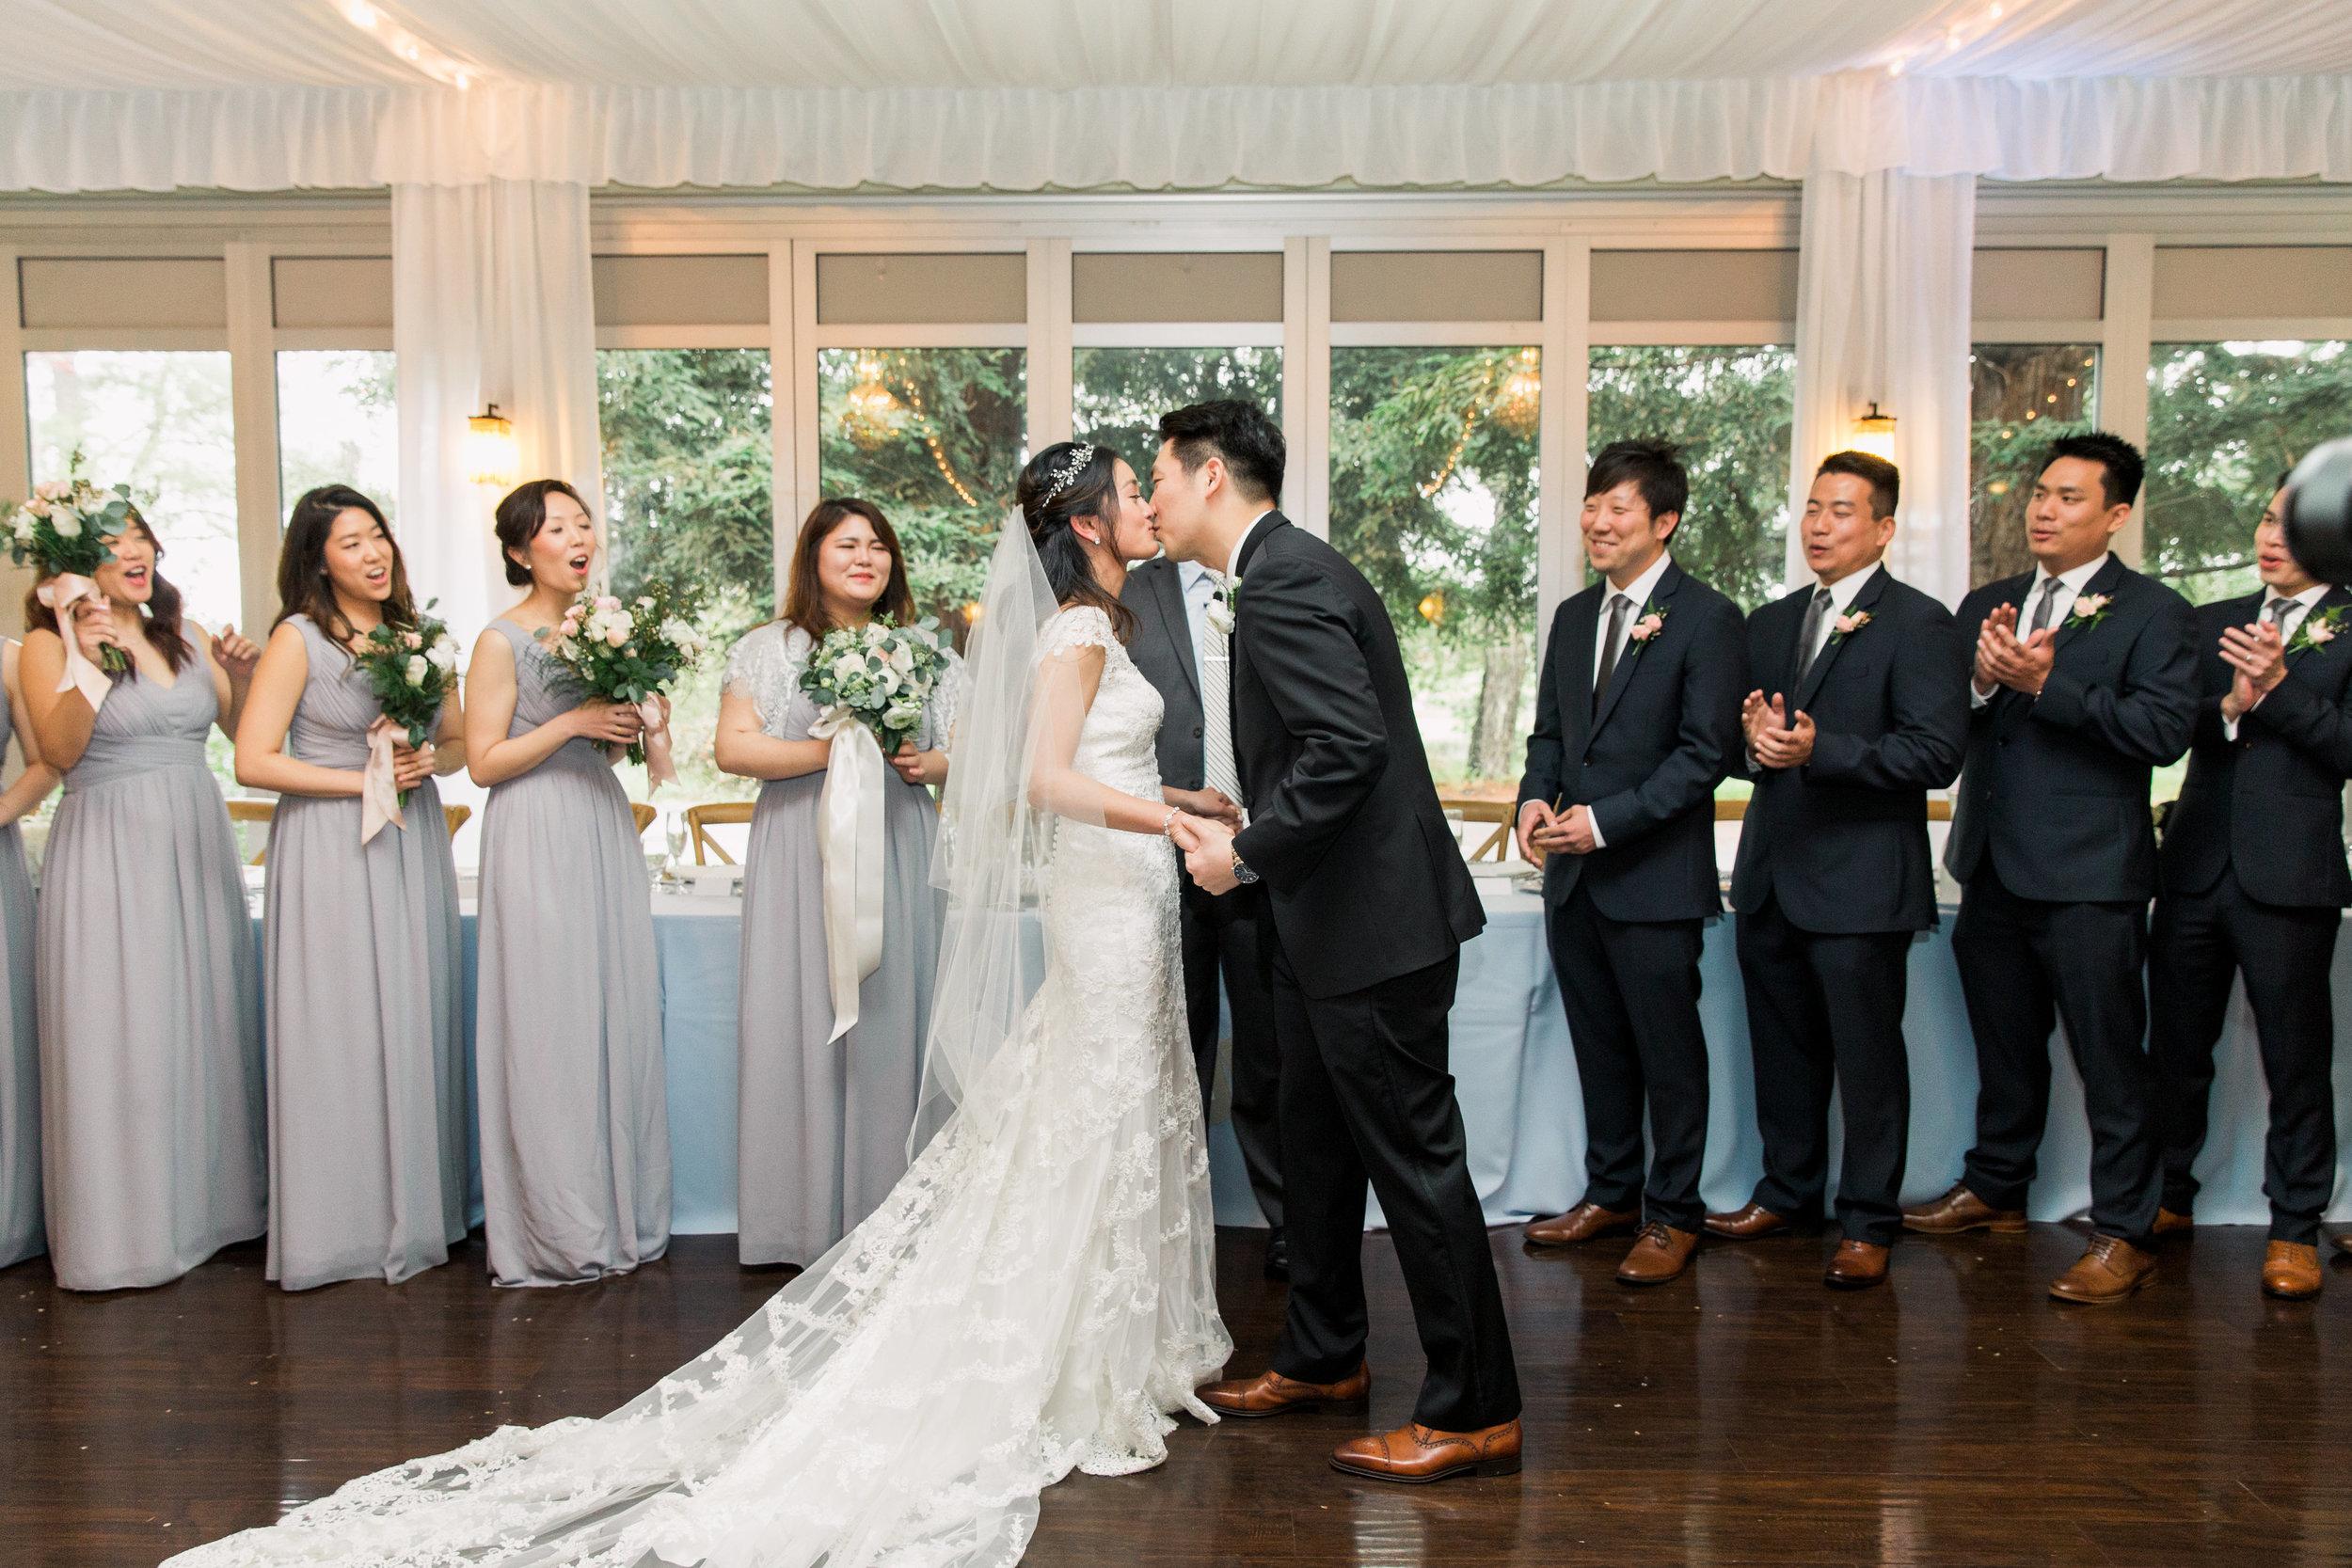 JA_Wedding_Ceremony_165.jpg